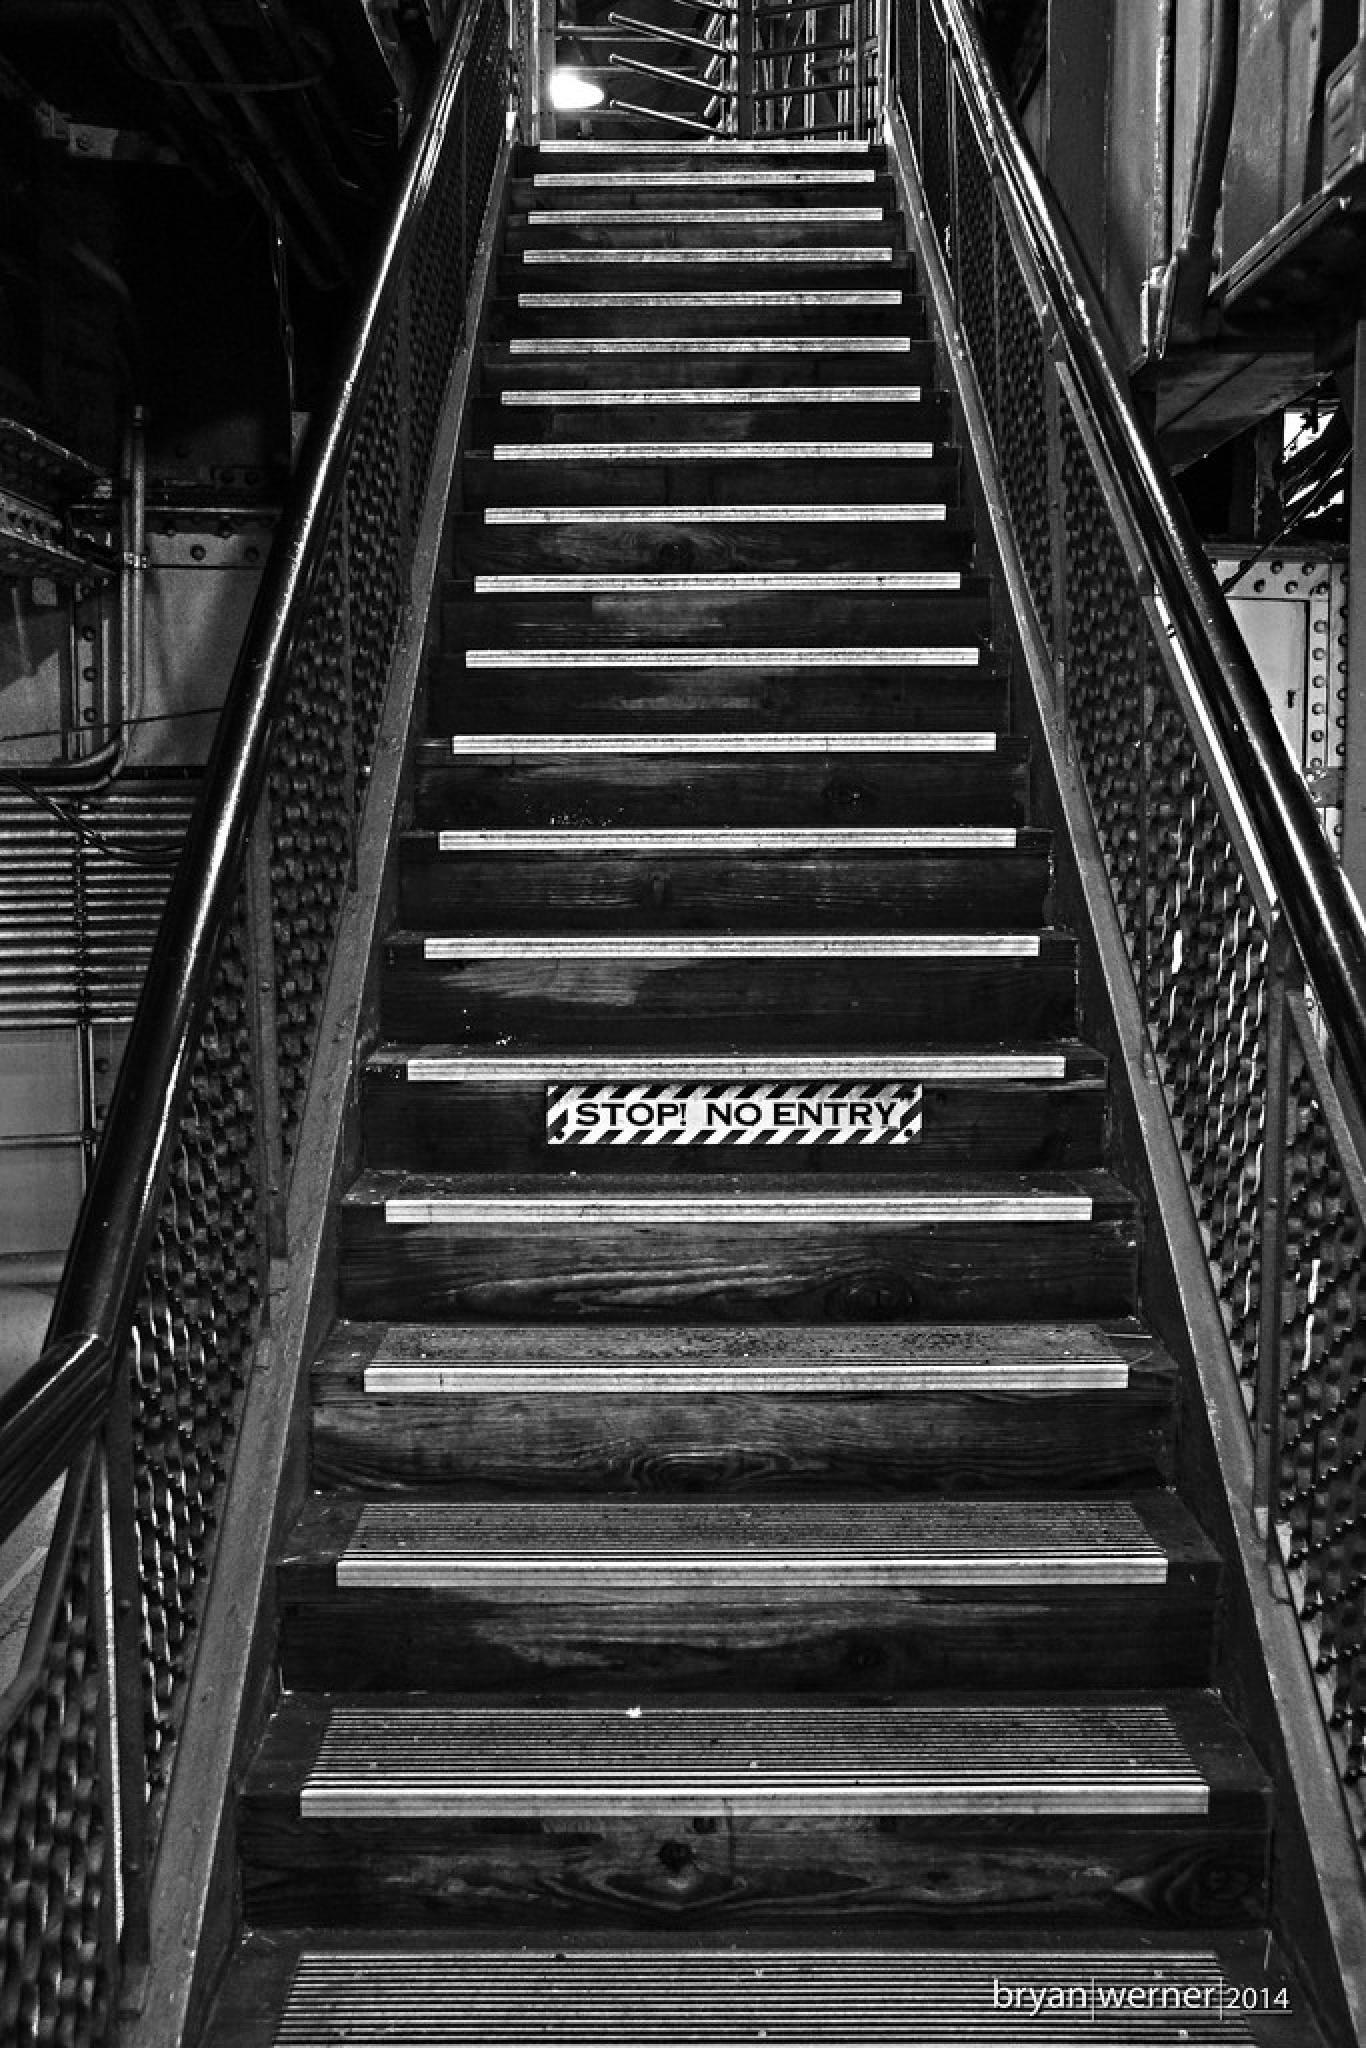 No Entry by Bryan Werner